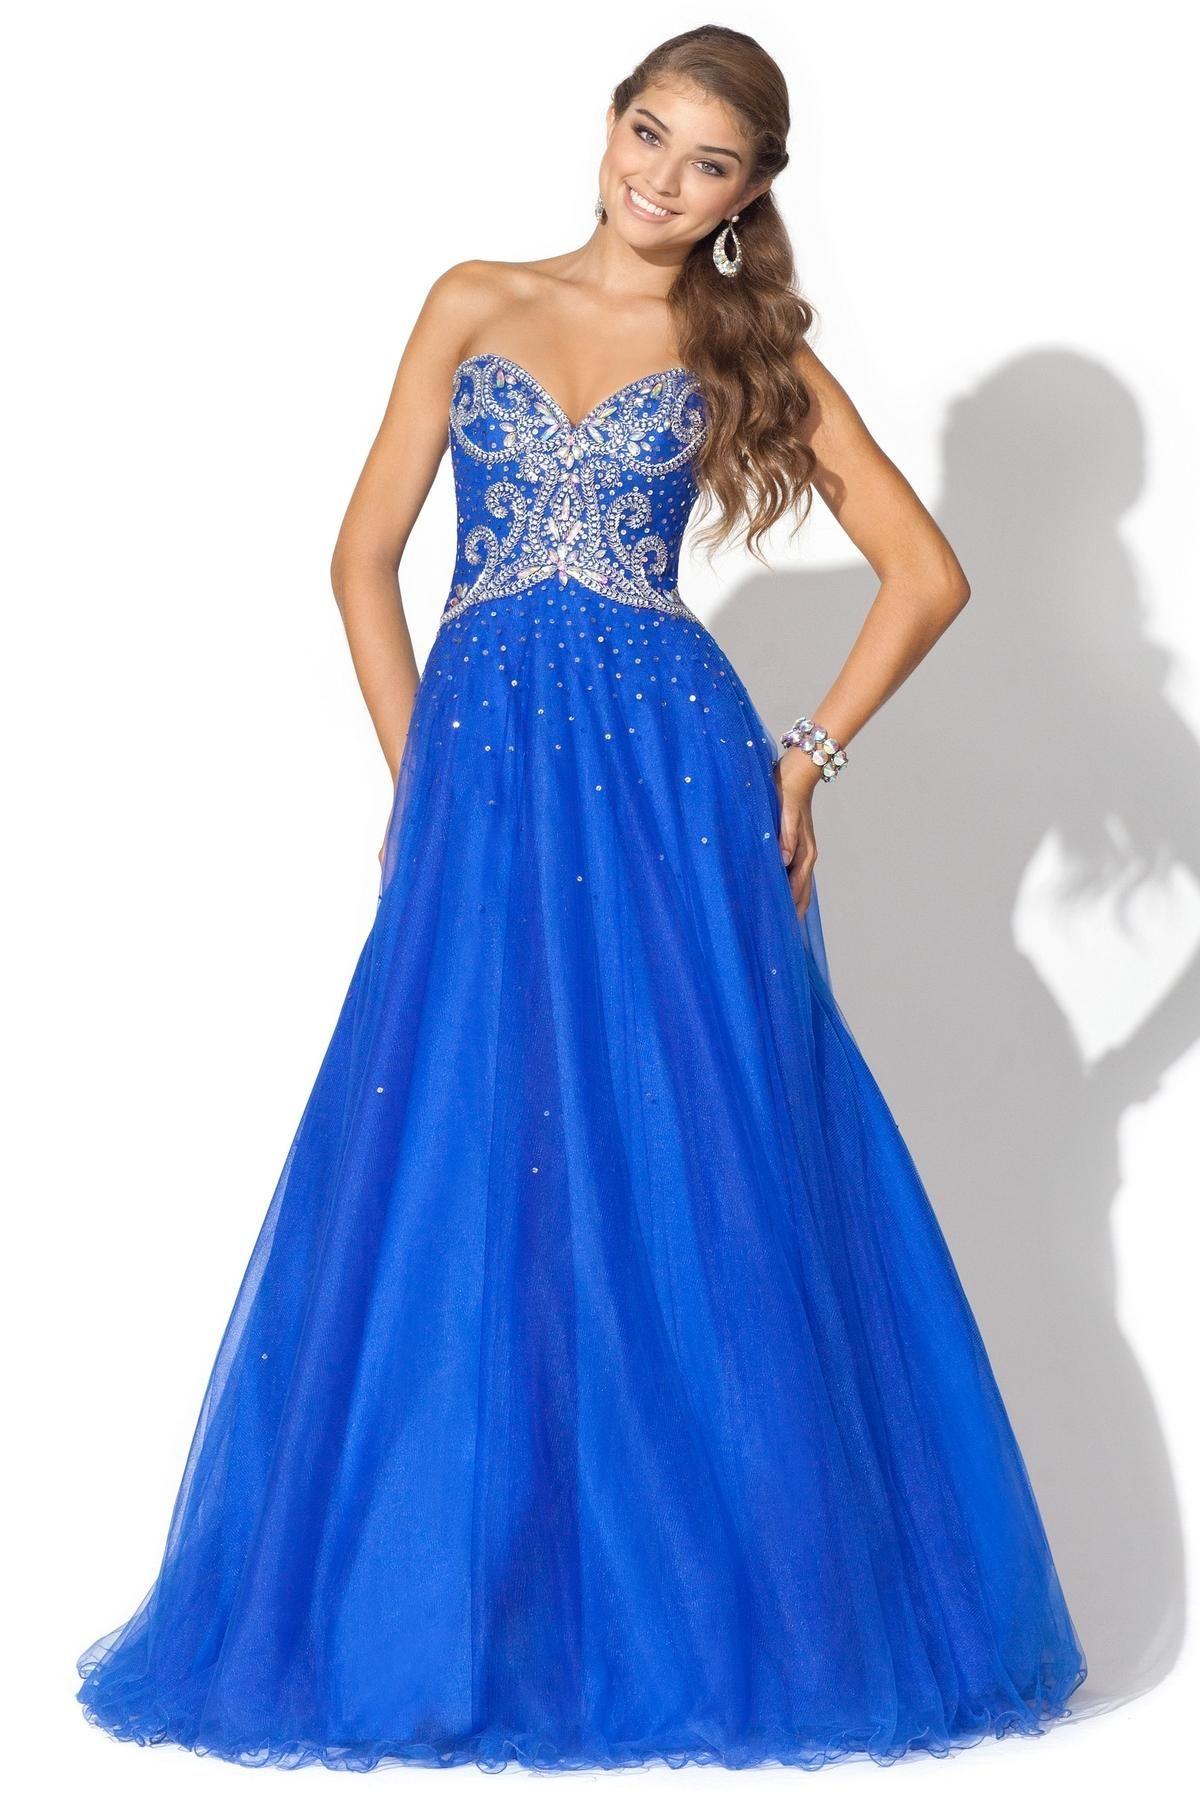 Pin By Steve Pegler On Nice Prom Dresses Blue Princess